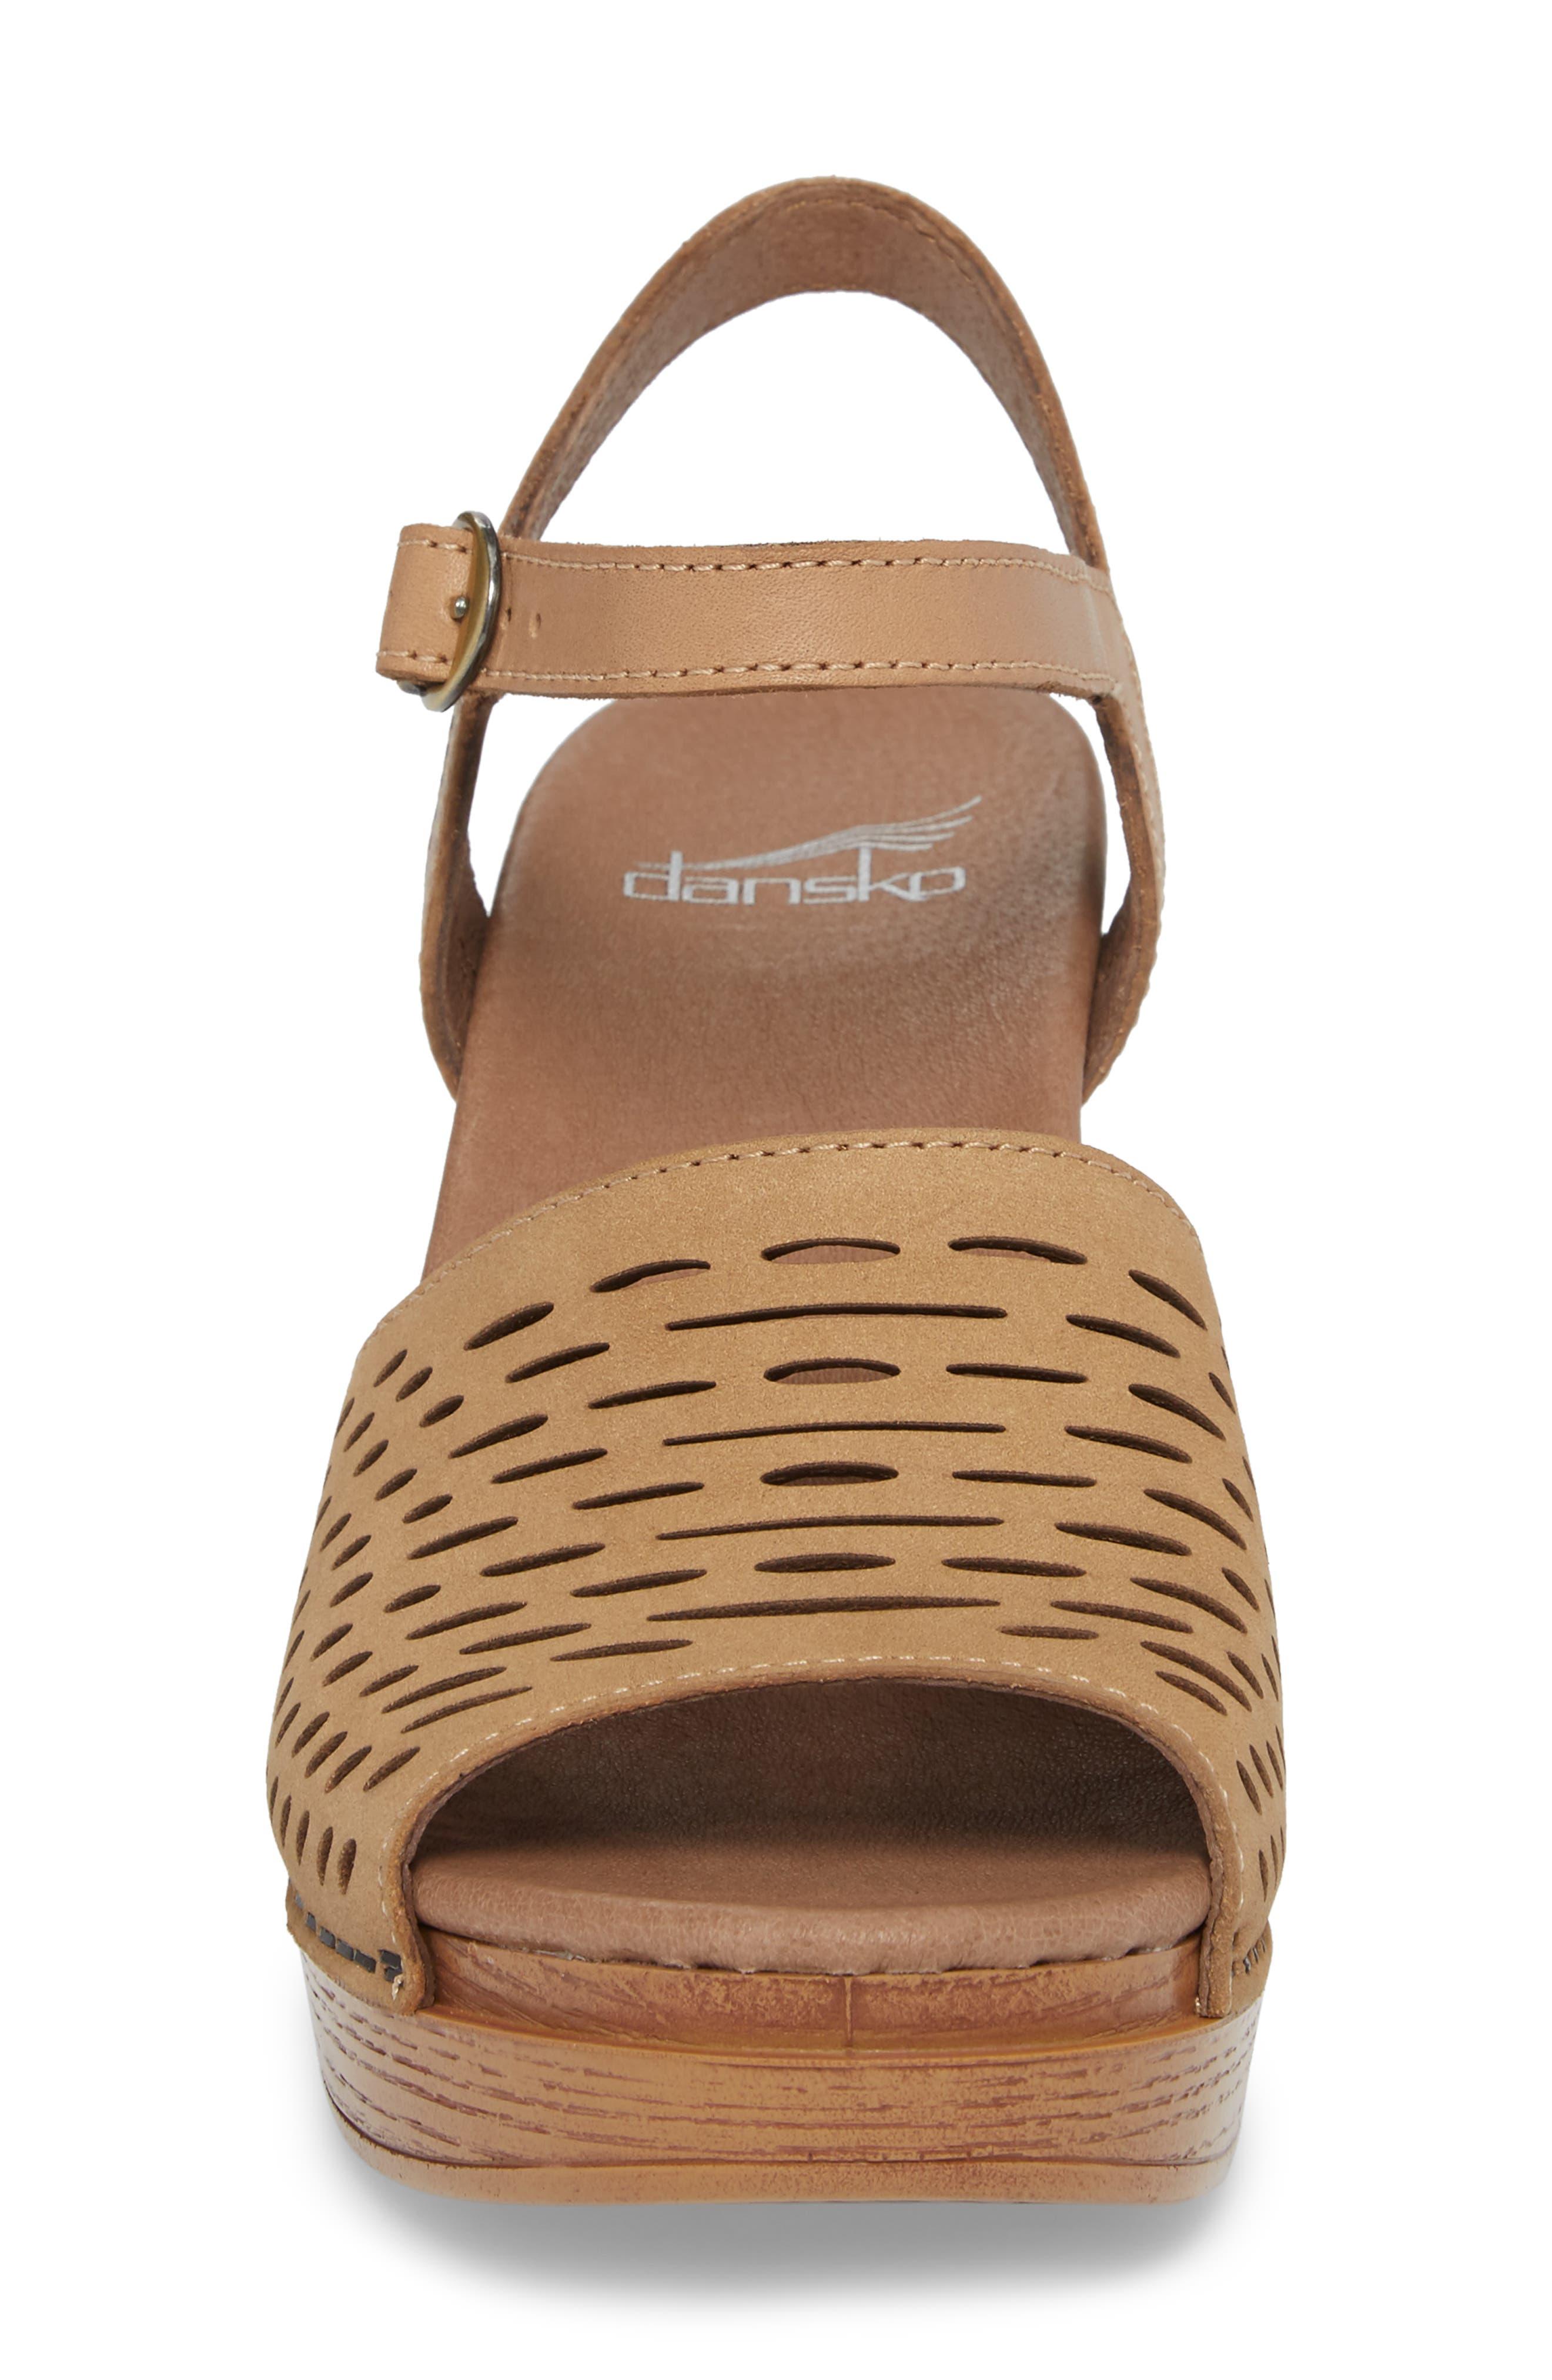 Denita Block Heel Sandal,                             Alternate thumbnail 4, color,                             SAND MILLED NUBUCK